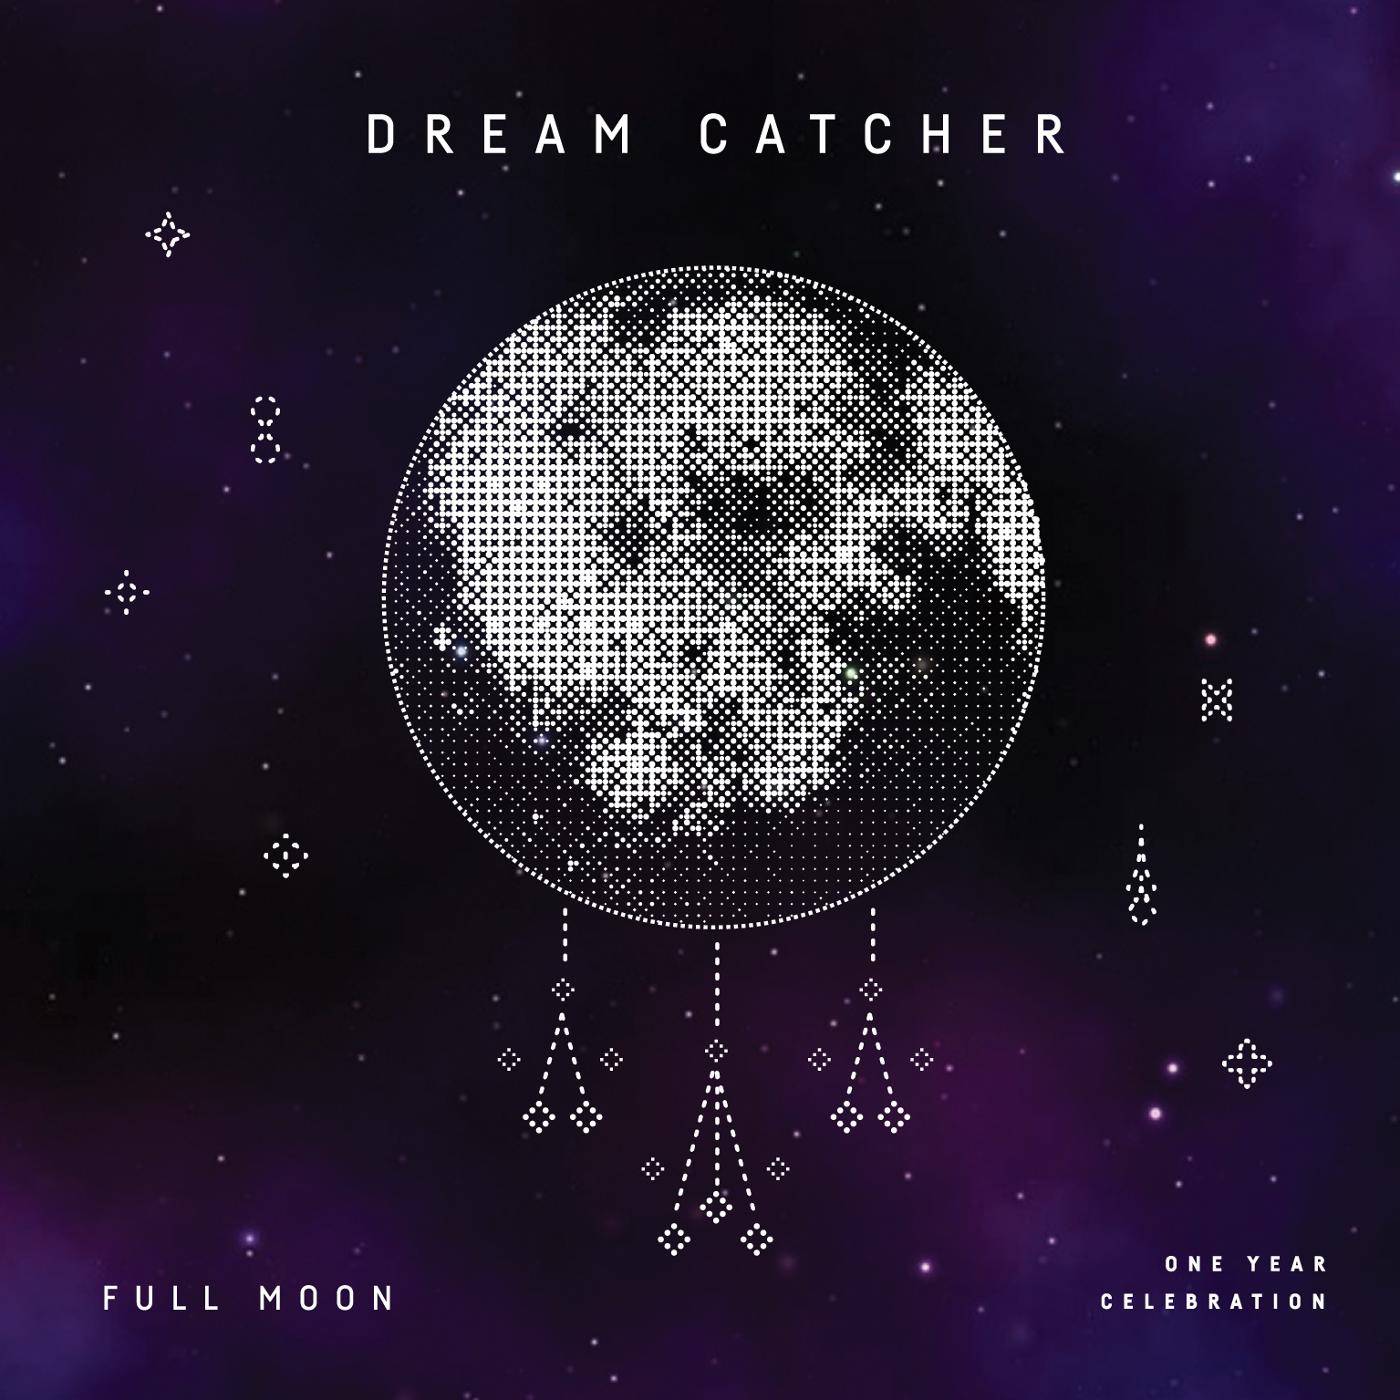 Full Moon (Dreamcatcher)